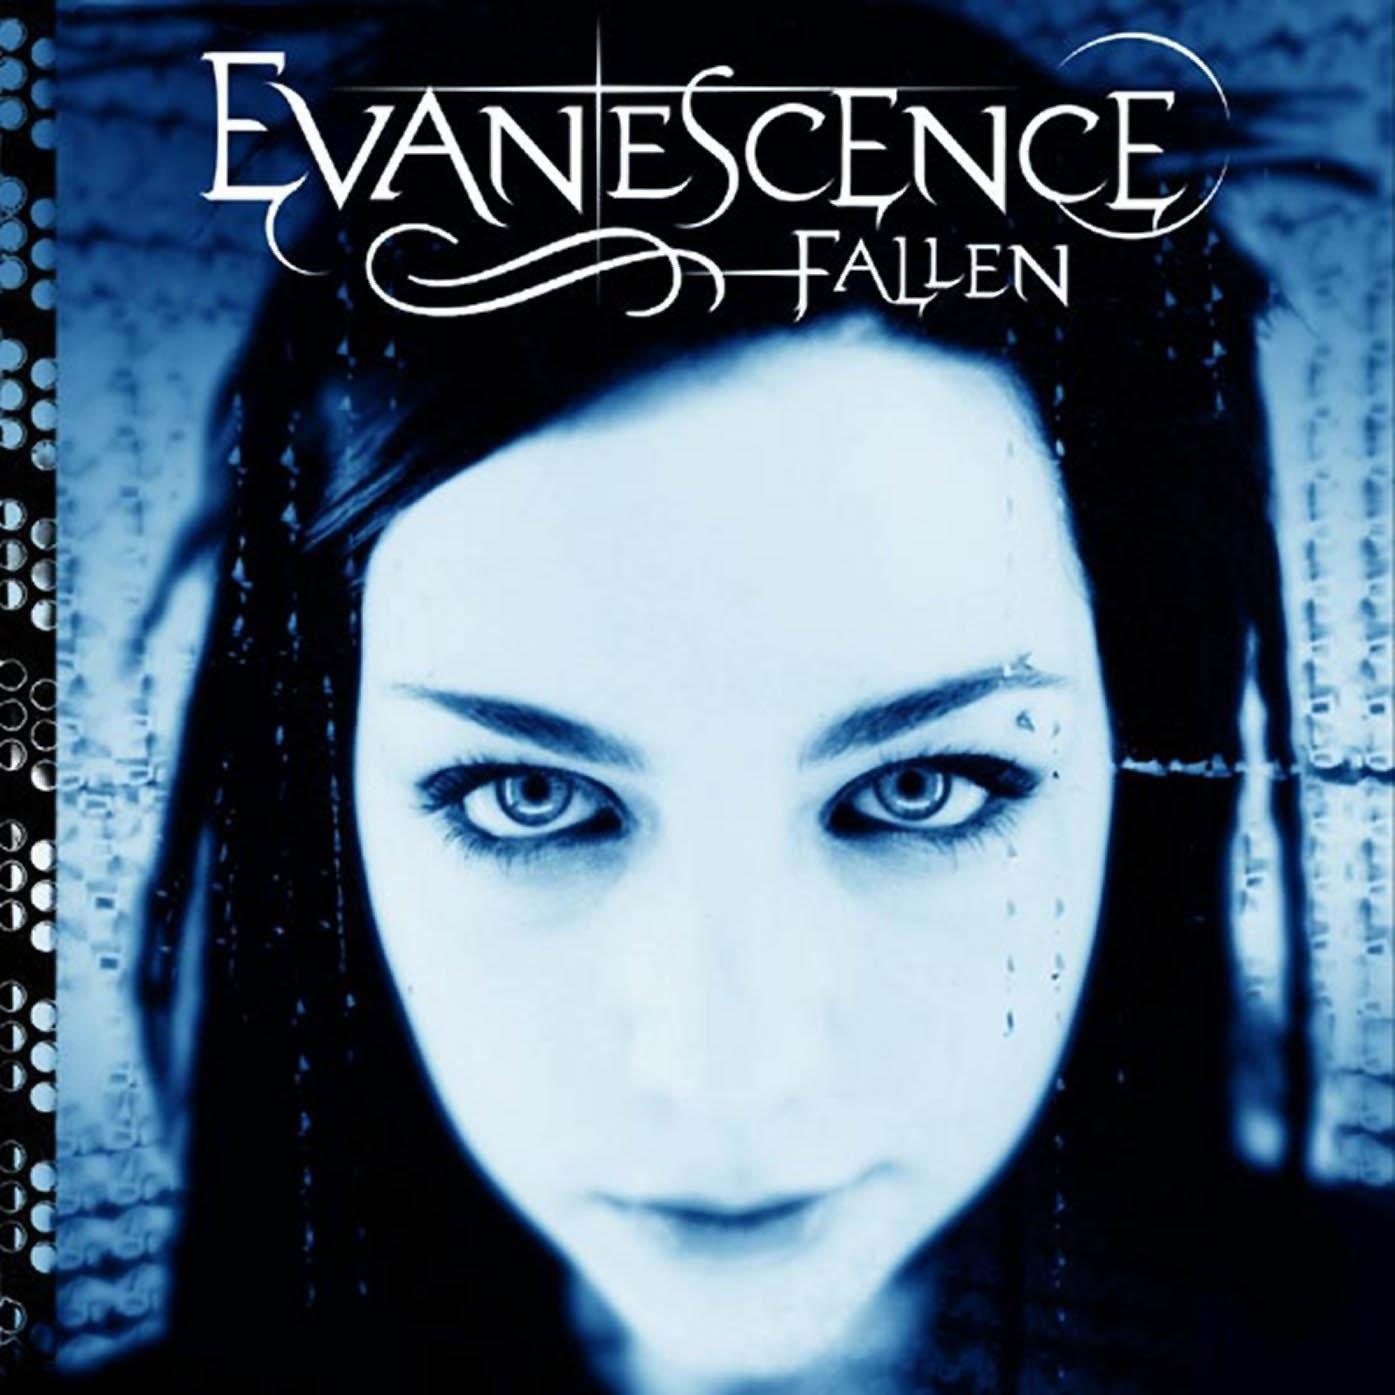 http://4.bp.blogspot.com/-SVUvmQP25I0/T4t1VmN_Z1I/AAAAAAAAA6M/8tzR51Y_beA/s1600/Evanescence-Fallen-Frontal.jpg